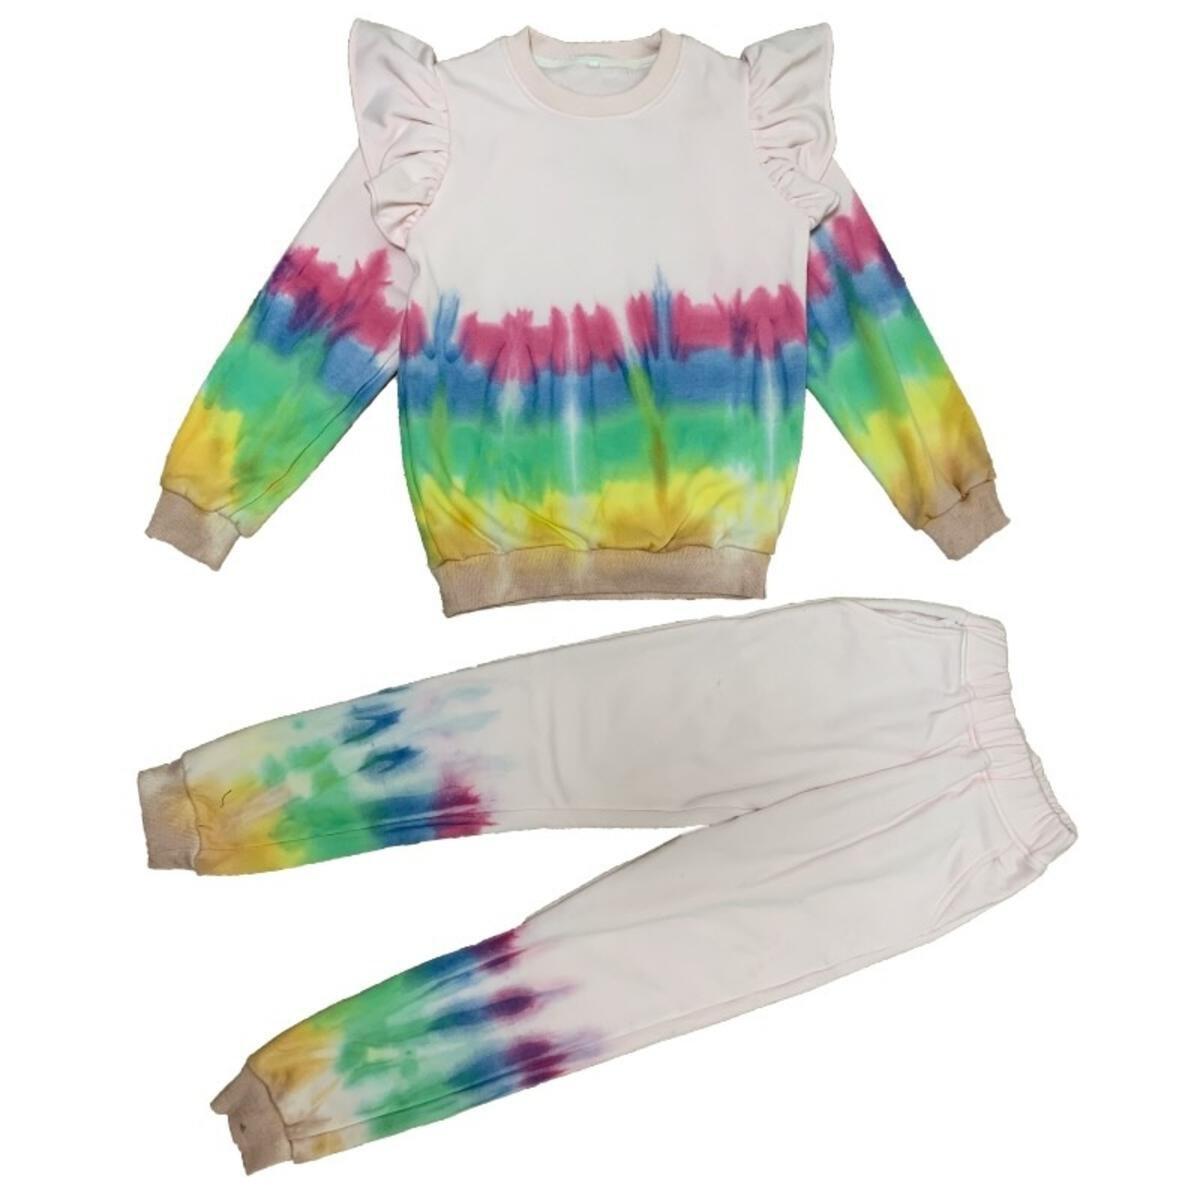 Rainbow Tie Dye Ruffle Shirt and Pants Set